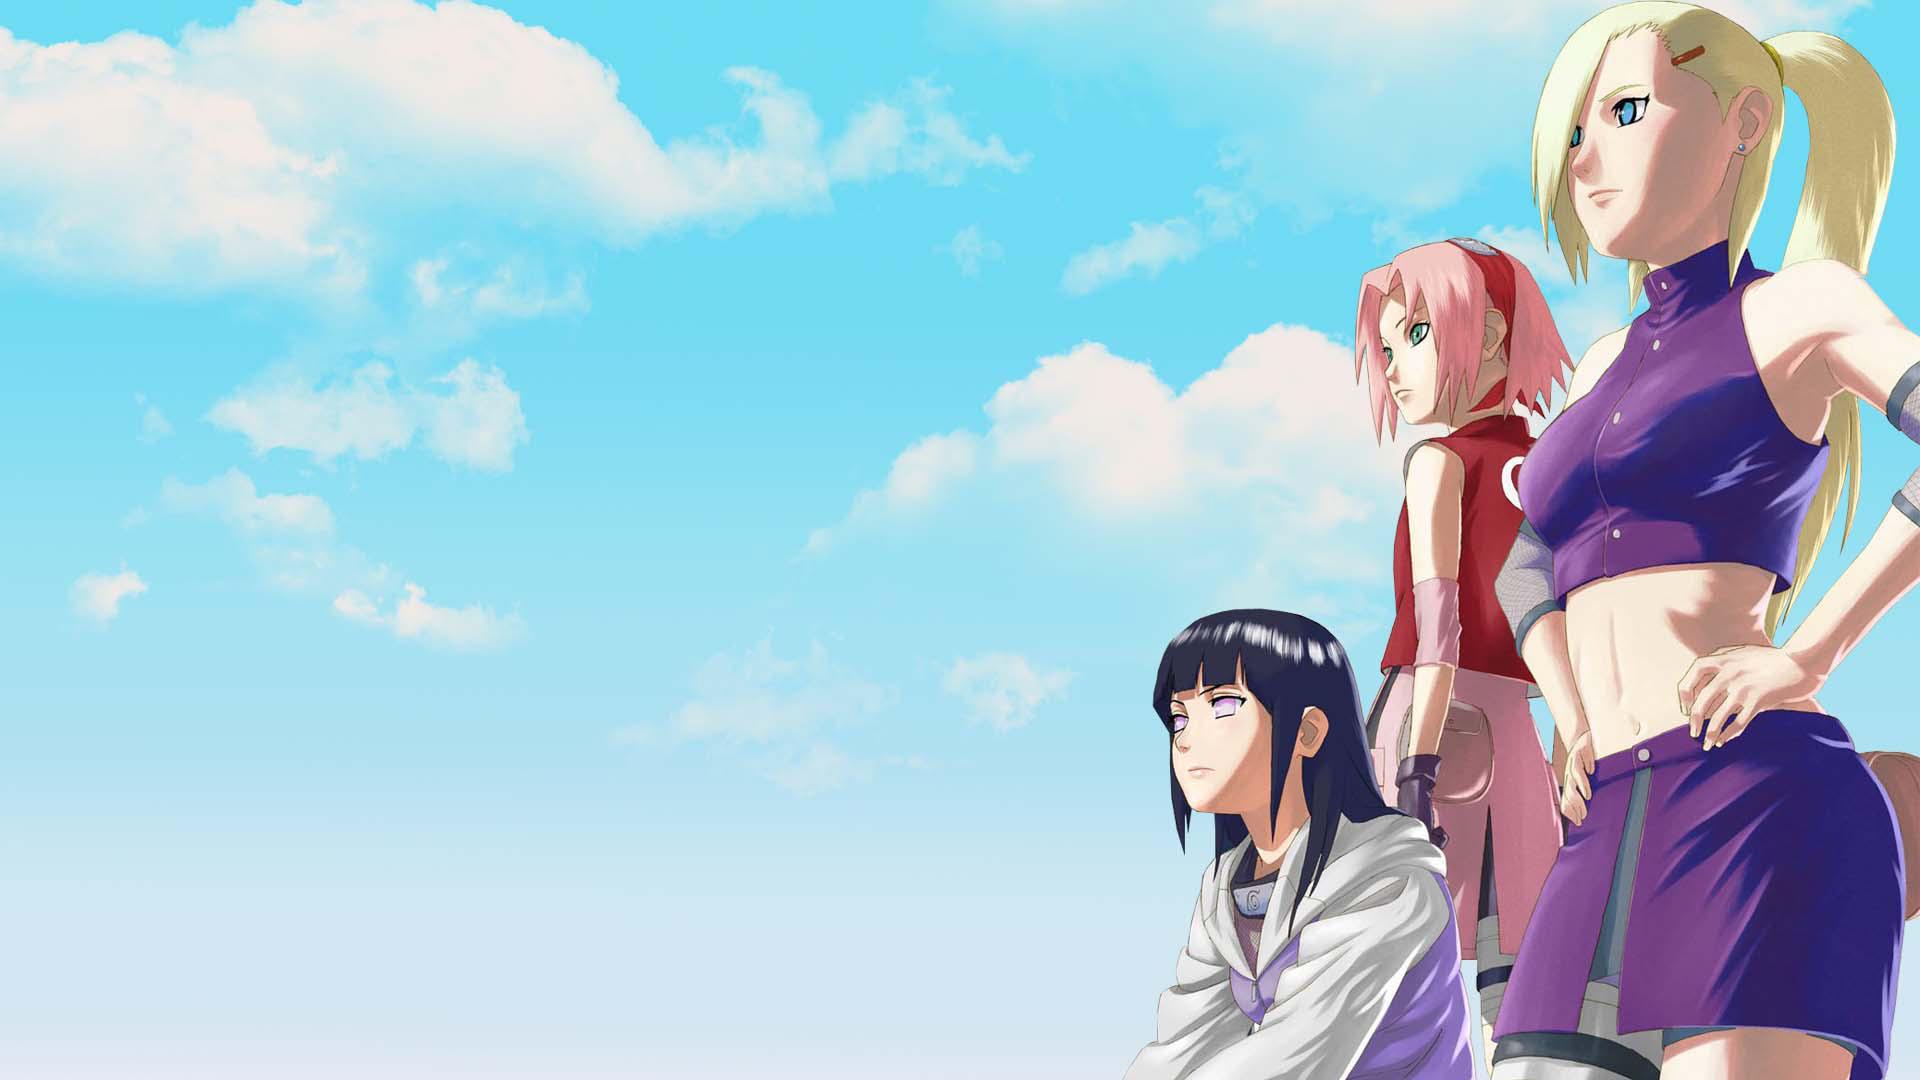 girls from naruto full hd wallpaper Sakura Haruno Hinata Hyuga Ino 1920x1080